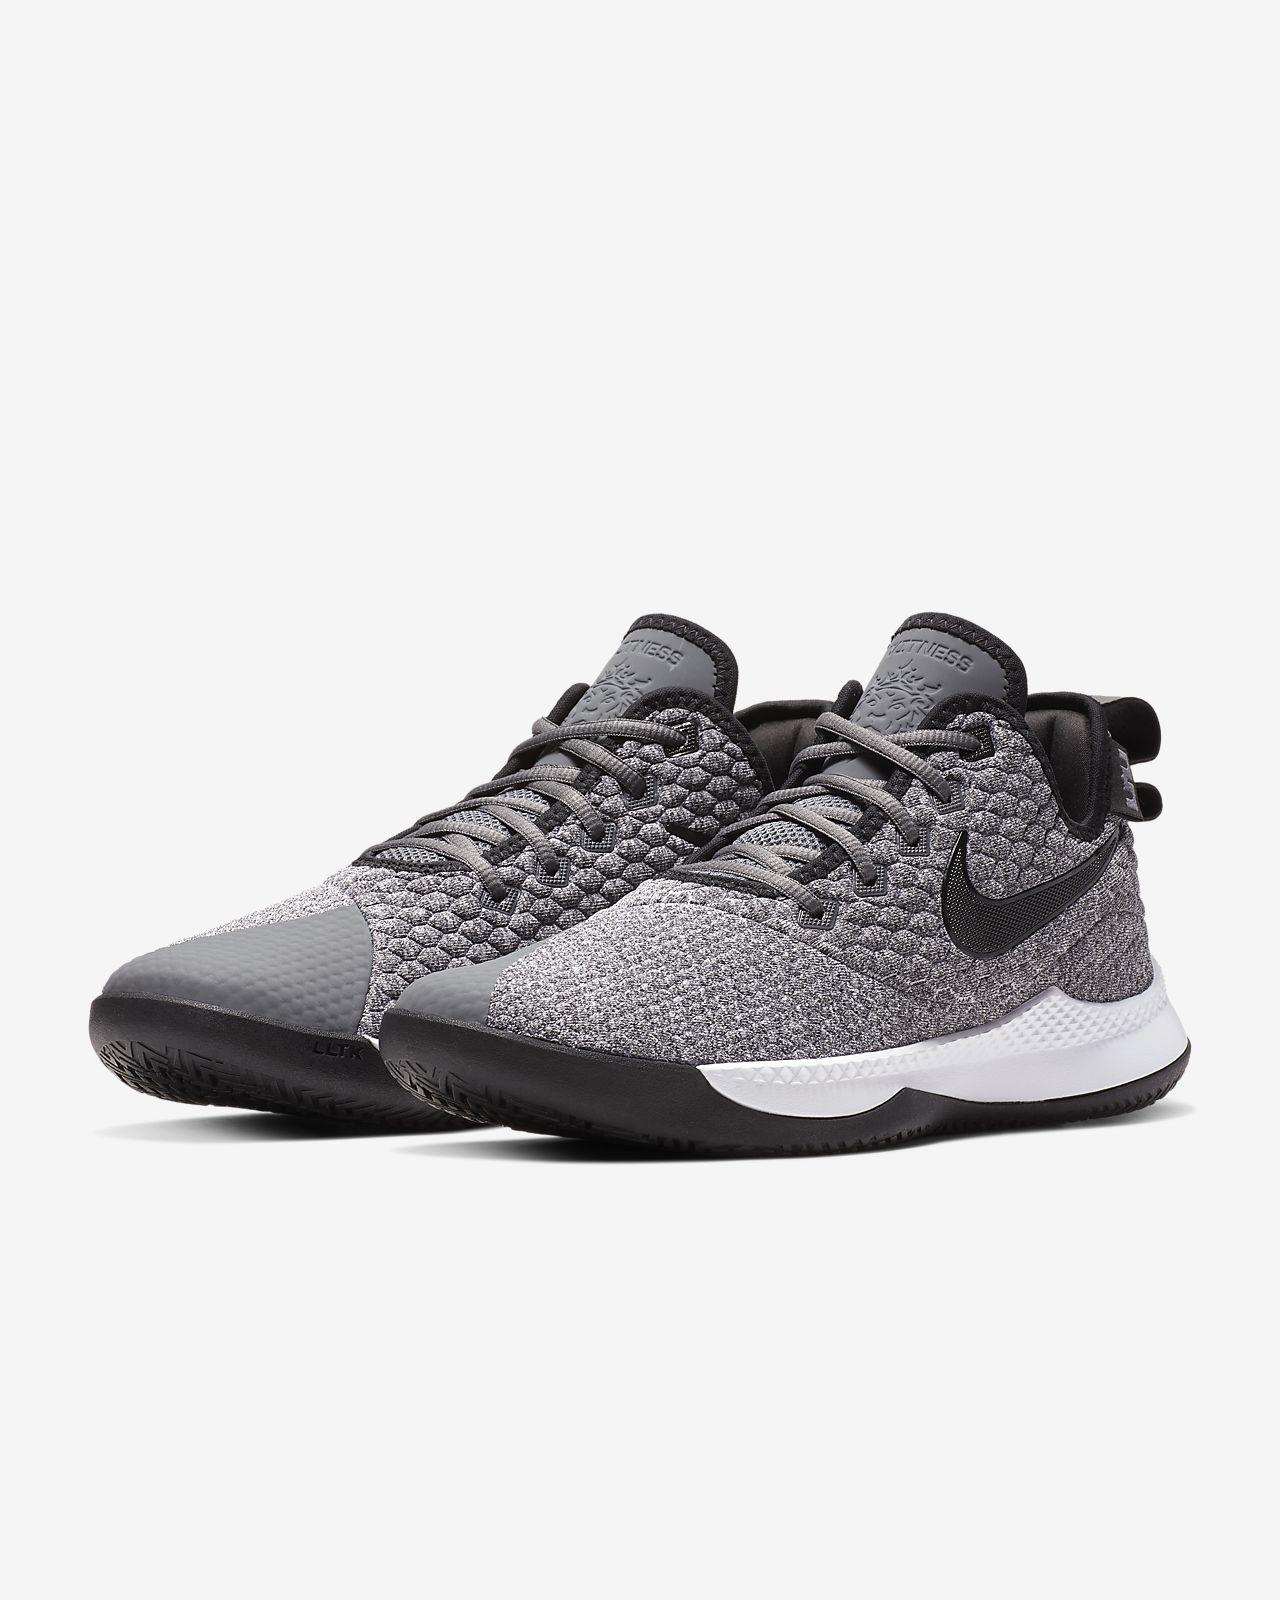 b1317f244f Calzado para hombre LeBron Witness III. Nike.com MX